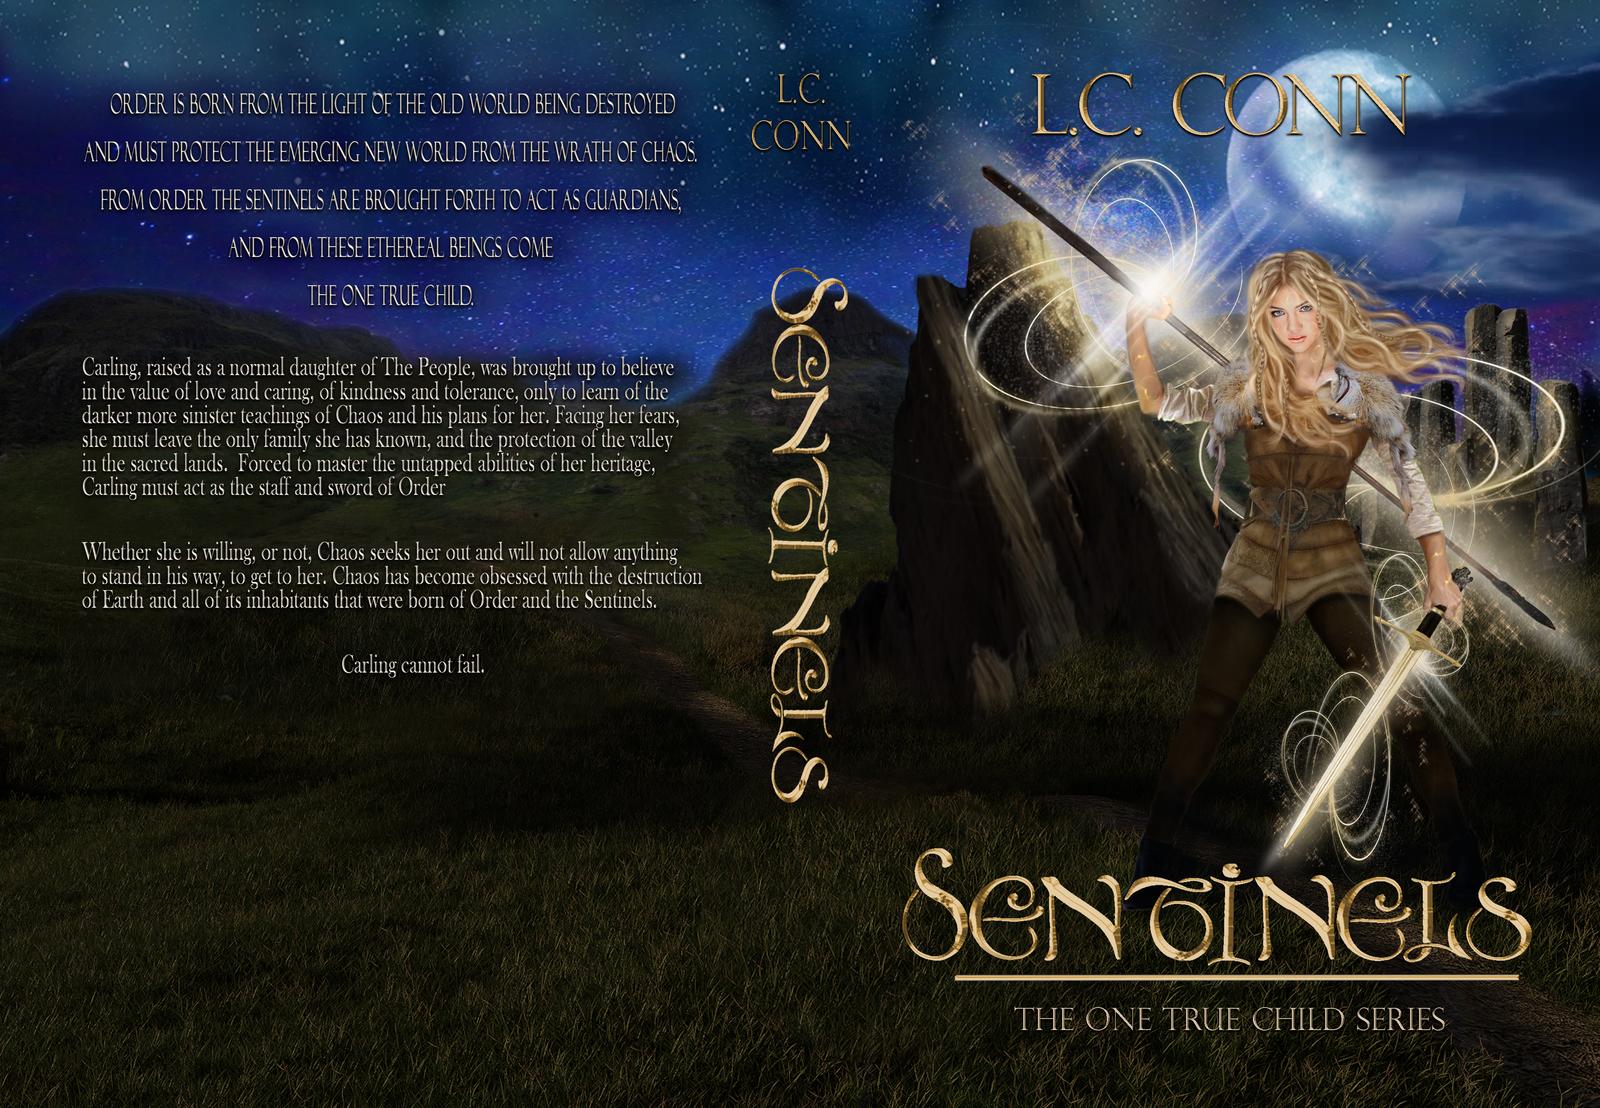 LC Conn - Sentinels full.png